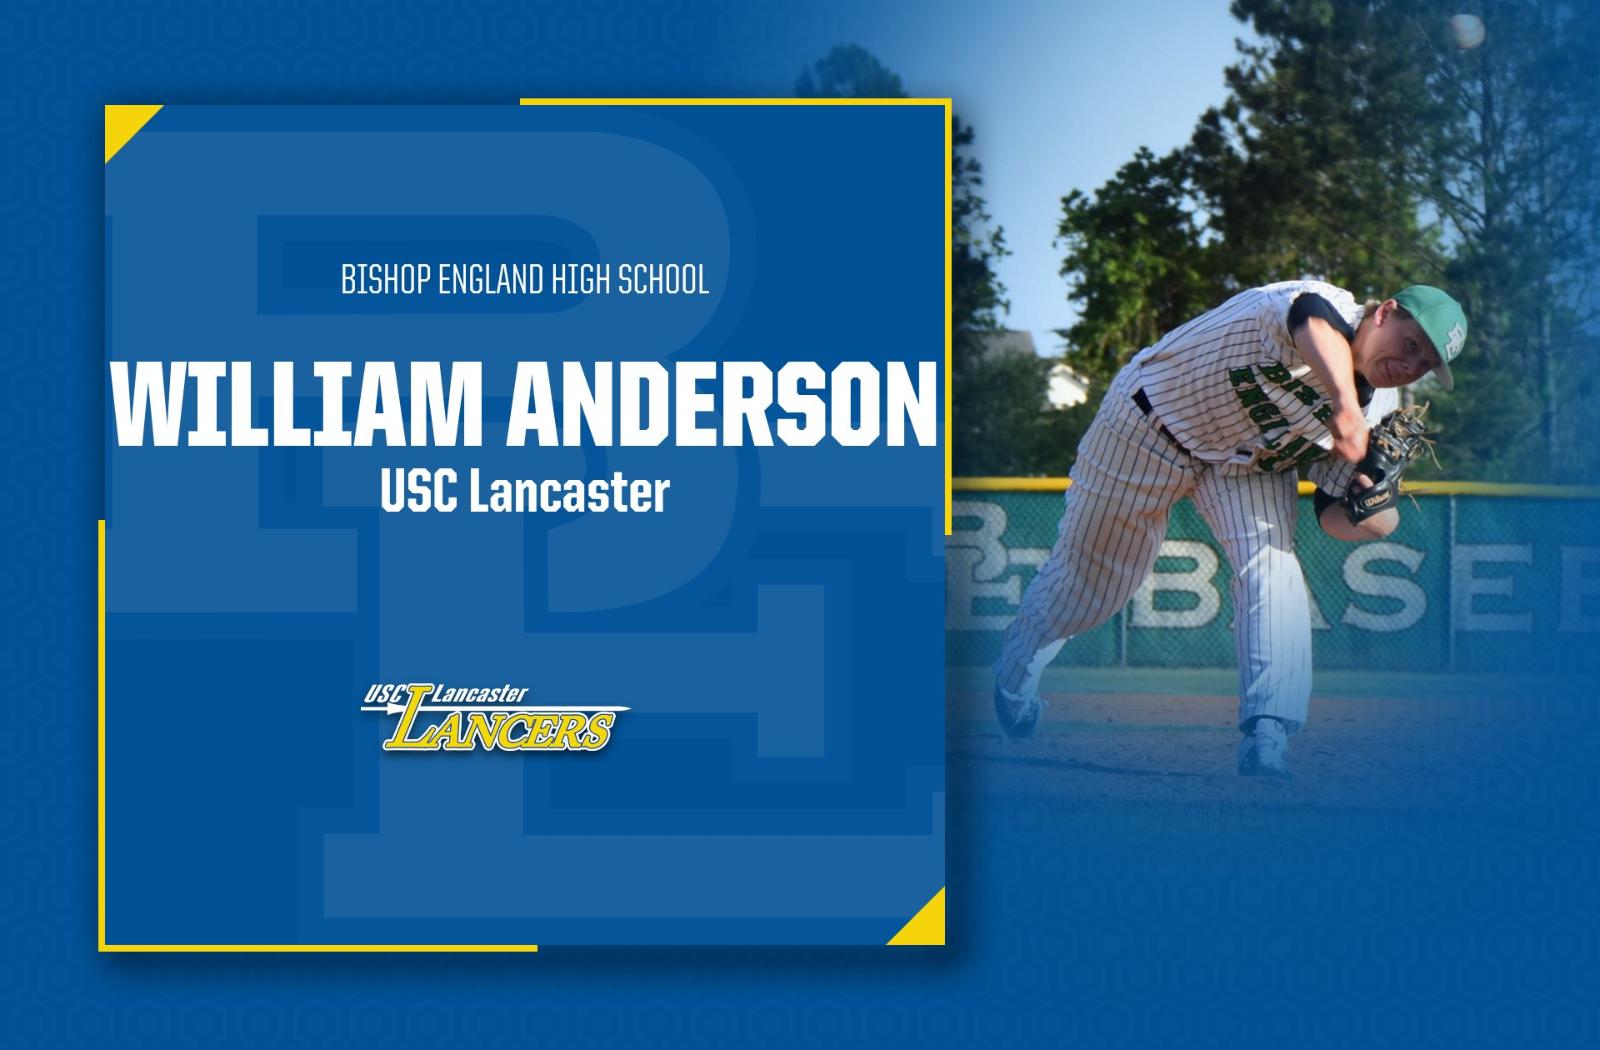 Congratulations to William Anderson